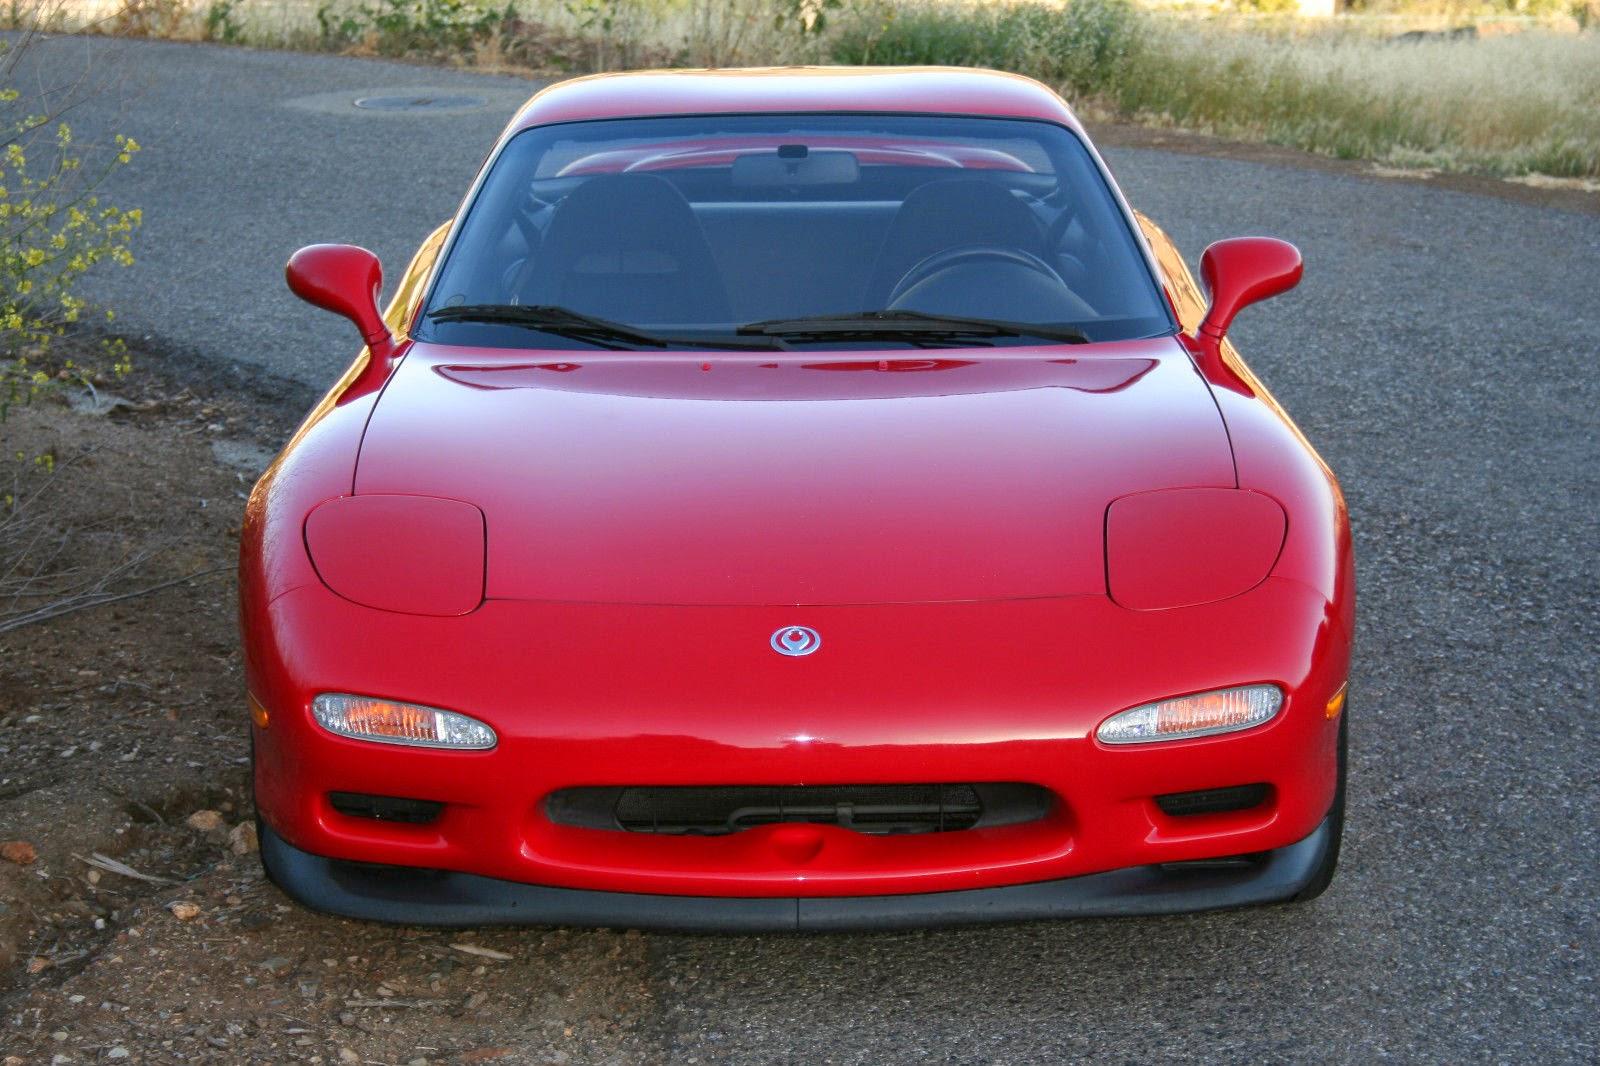 Lucky 8 Auto >> 1993 Mazda RX-7 Twin Turbo | Auto Restorationice